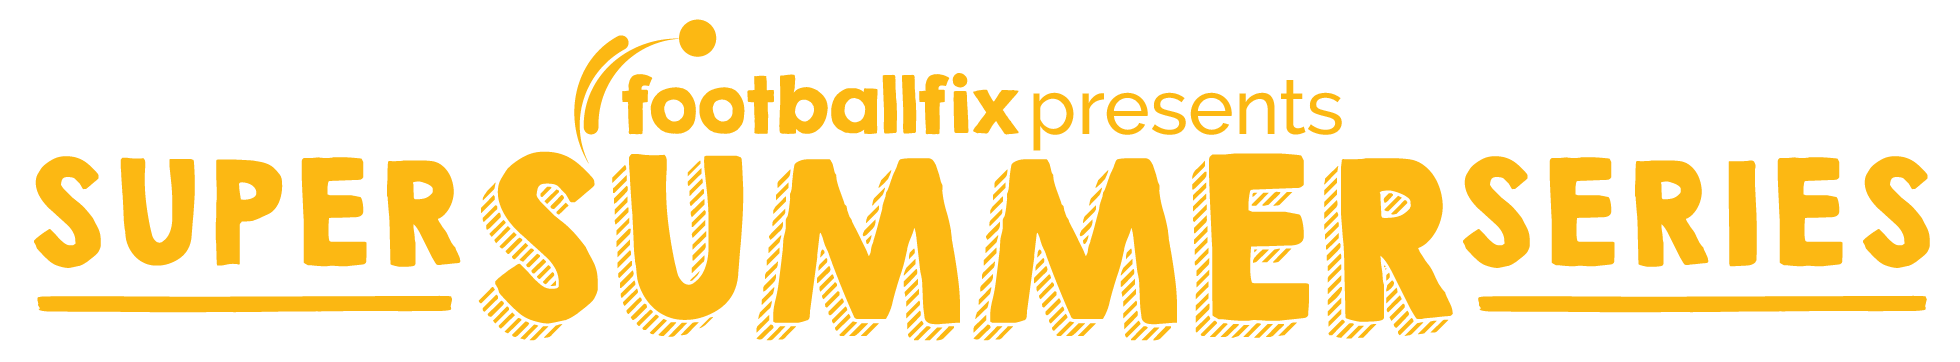 Super Summer Series: Tournaments & Events by FootballFix